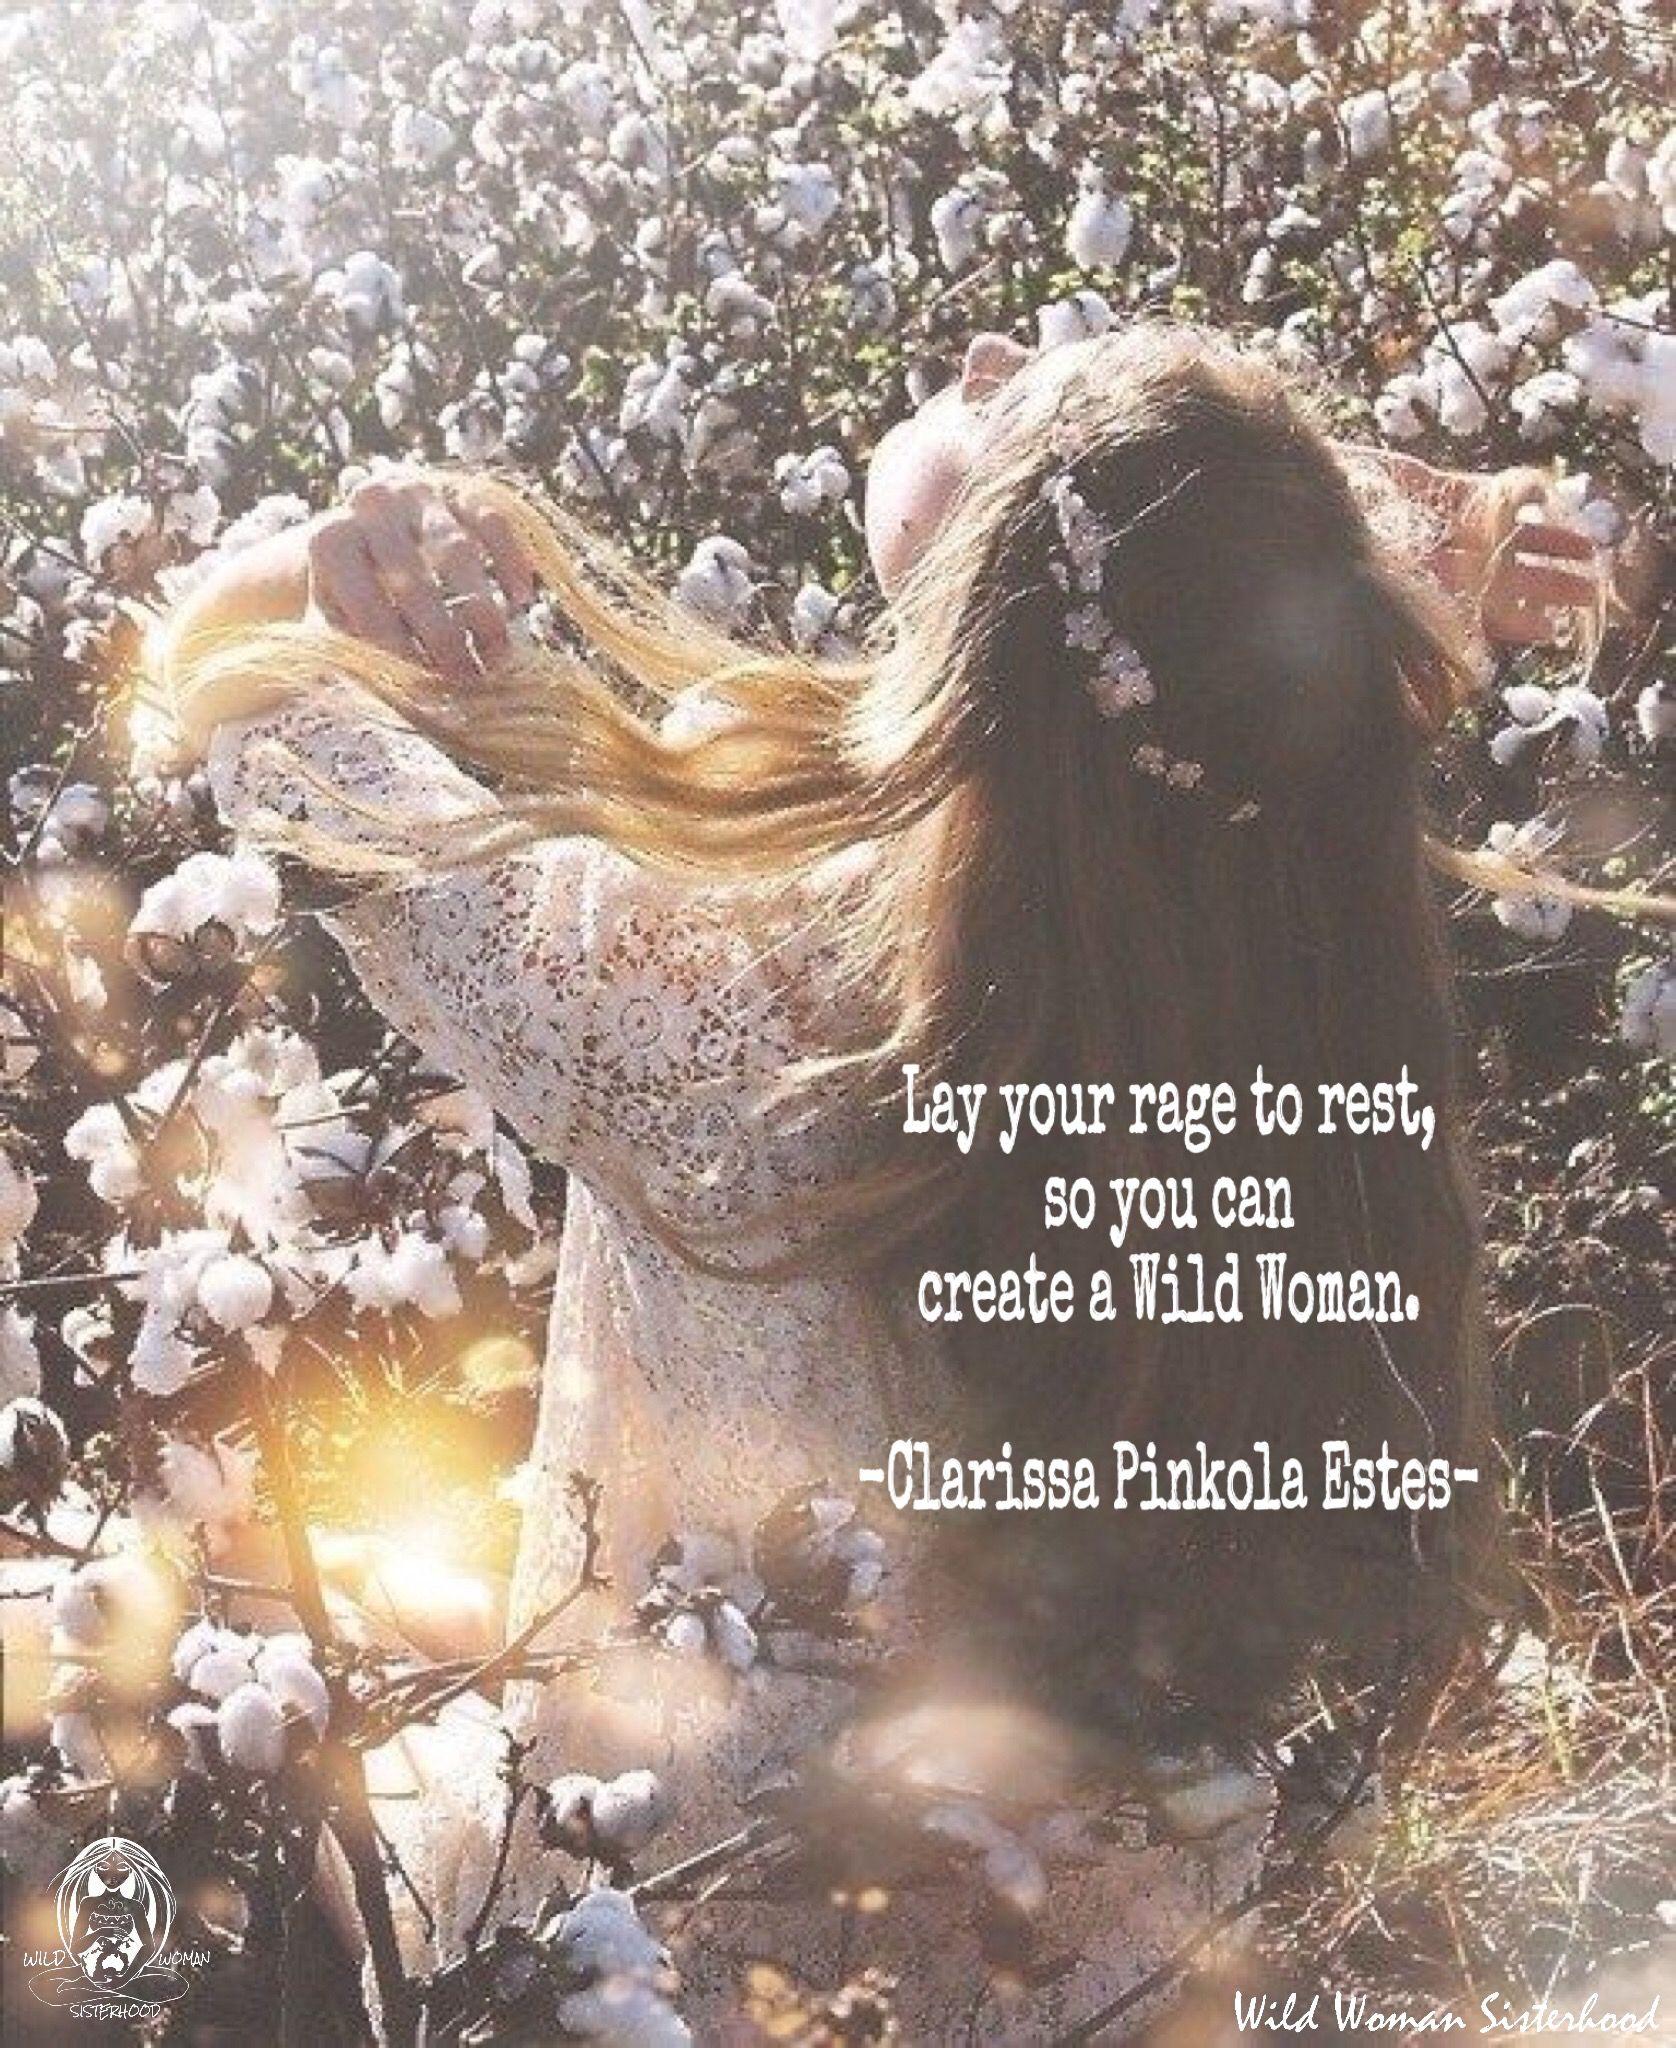 Lay your rage to rest, so you can create a Wild Woman. -Clarissa Pinkola Estes WILD WOMAN SISTERHOOD™ #WildWomanSisterhood #rewild #motherclarissa #madreclarissa #wildwomanmedicine #earthenspirit #nature #medicinewoman #wildwoman #wildwomen #wild #walkabout